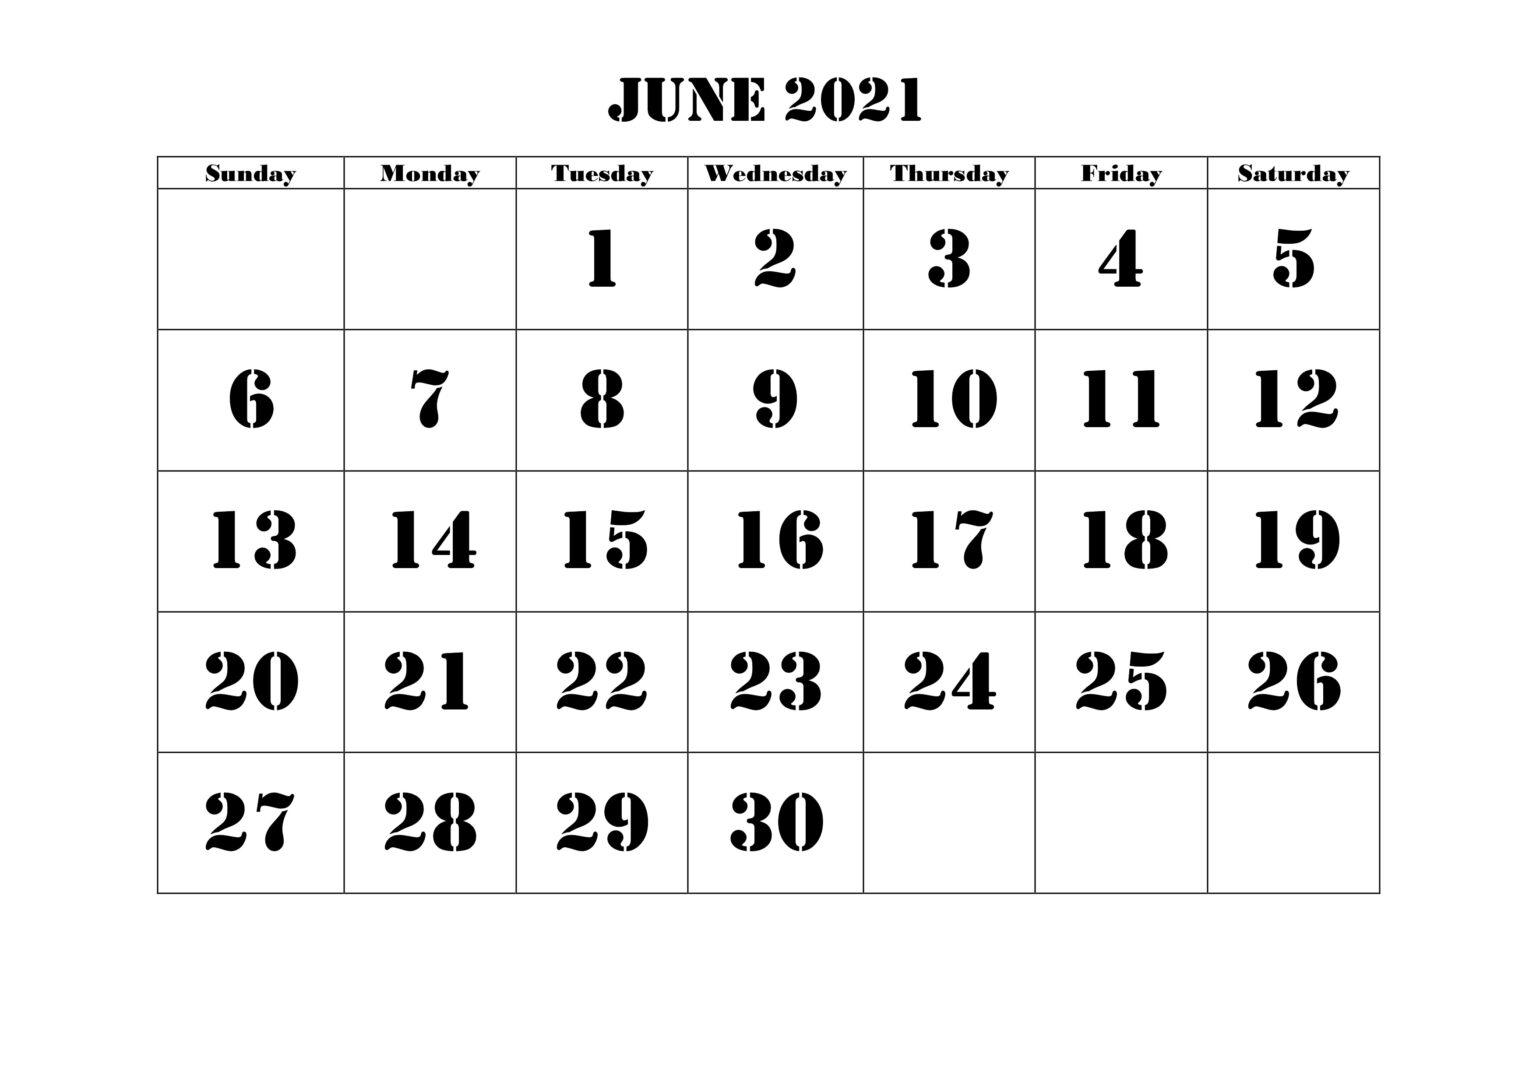 June calendar 2021 word